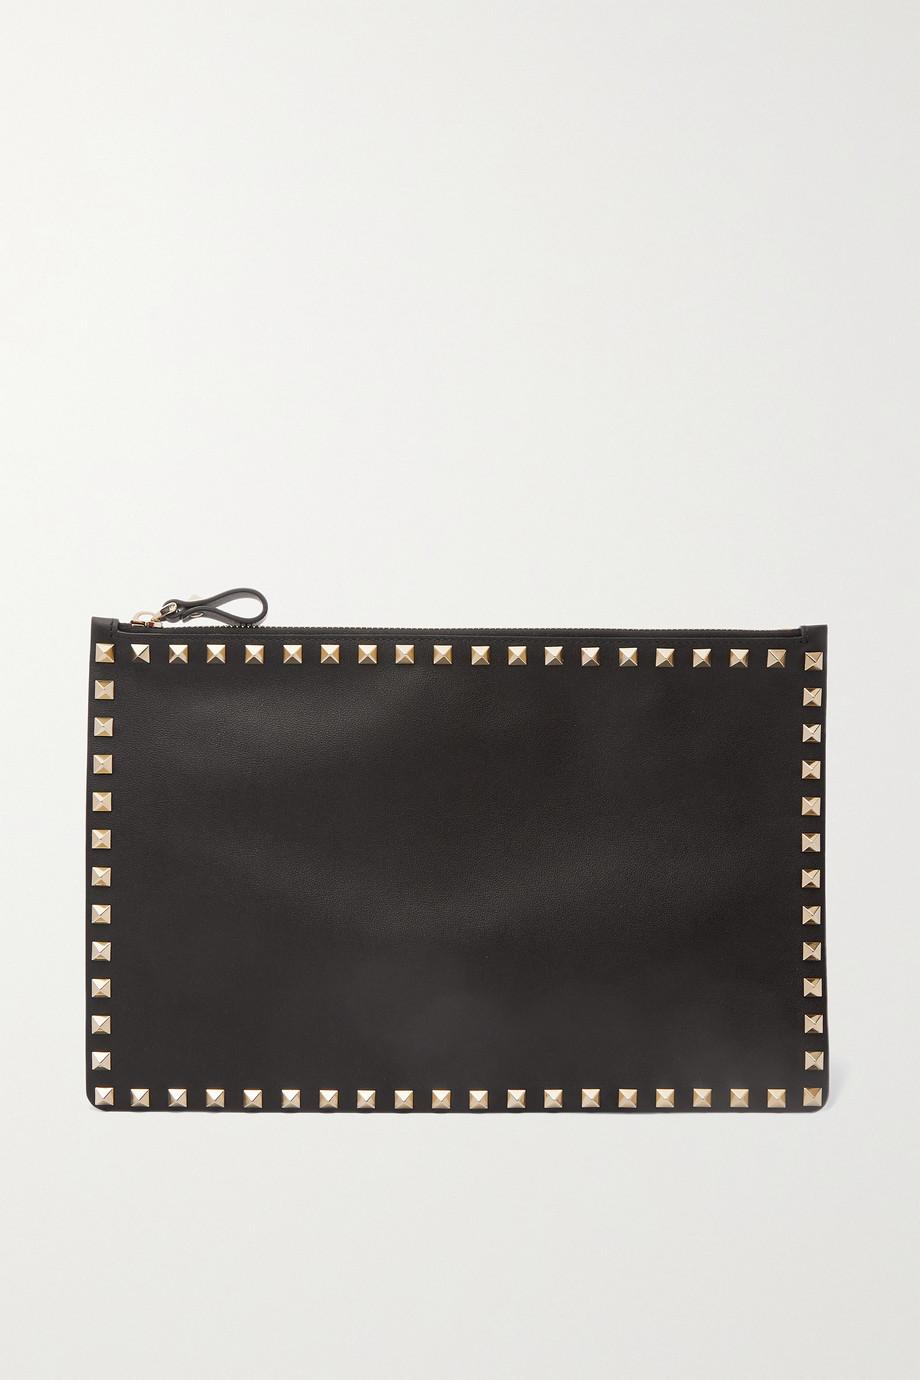 Valentino Valentino Garavani Rockstud large leather pouch